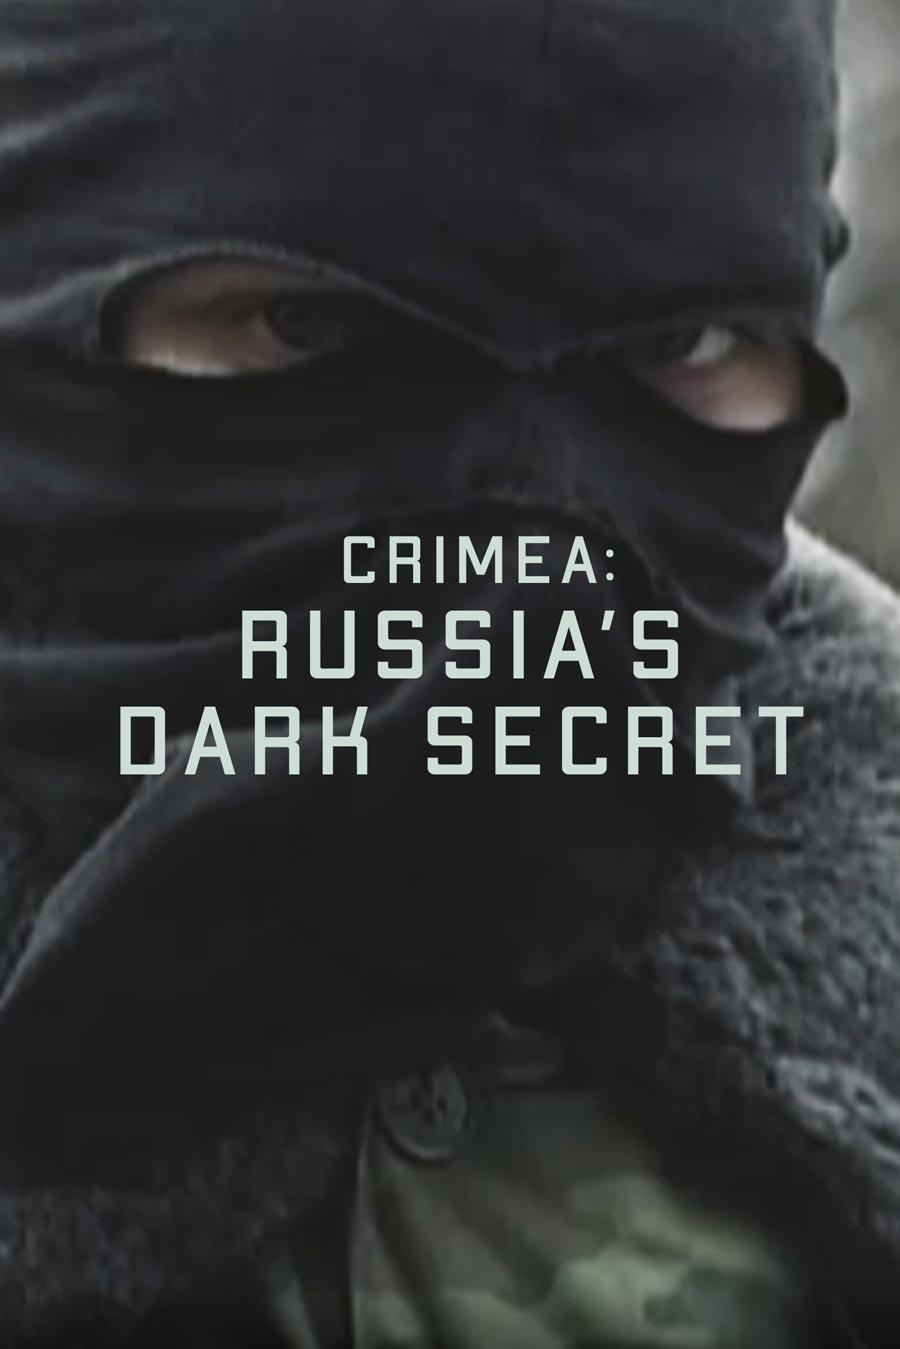 Crimea: Russia's Dark Secret